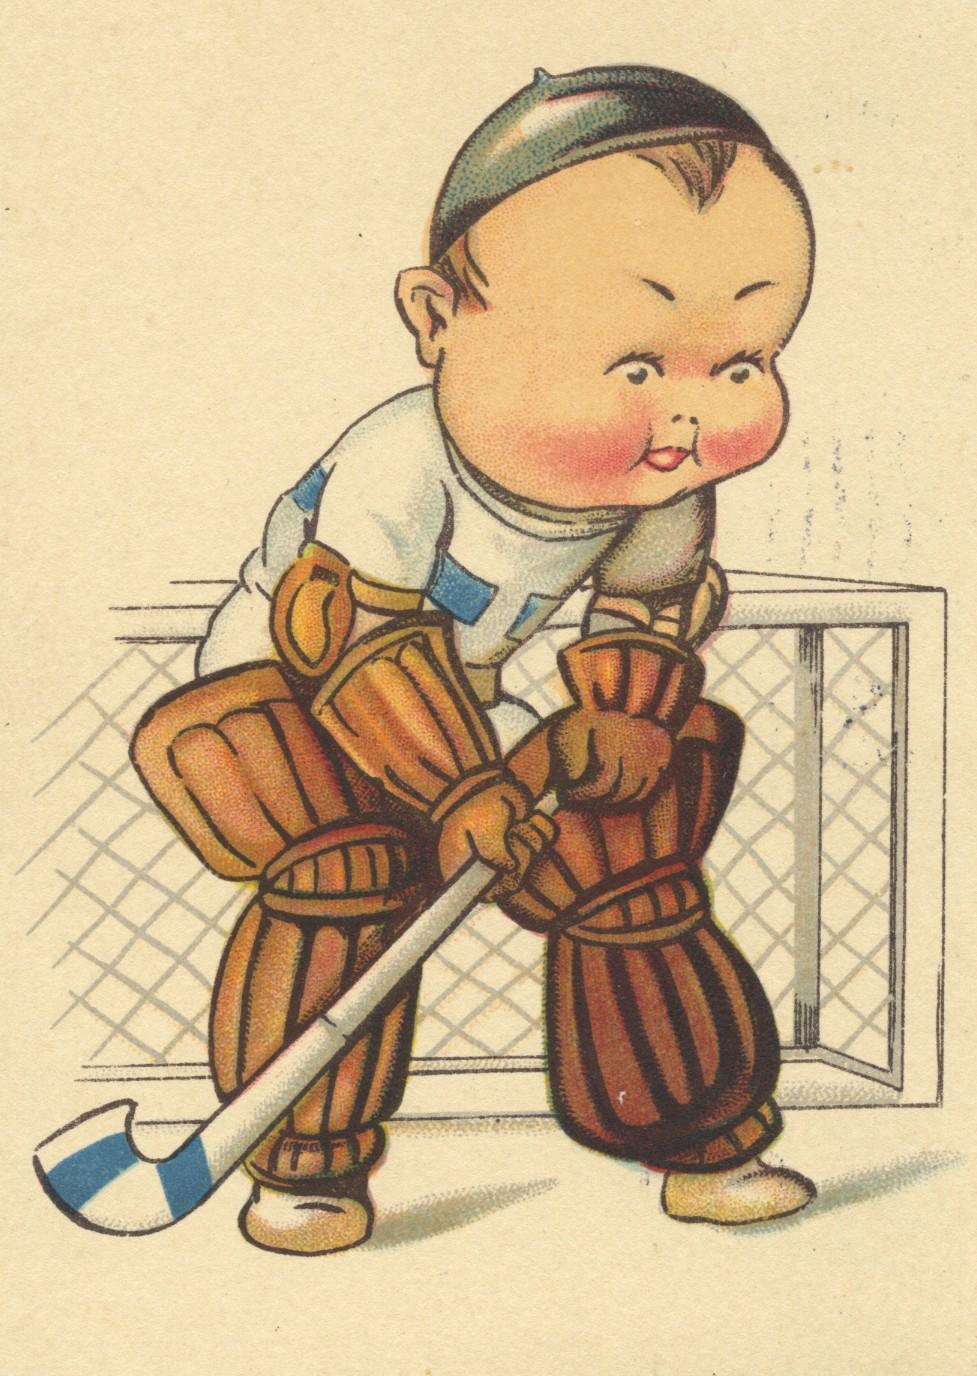 Cartoon Field Hockey Goalie 1934 Danmark Hockeygods